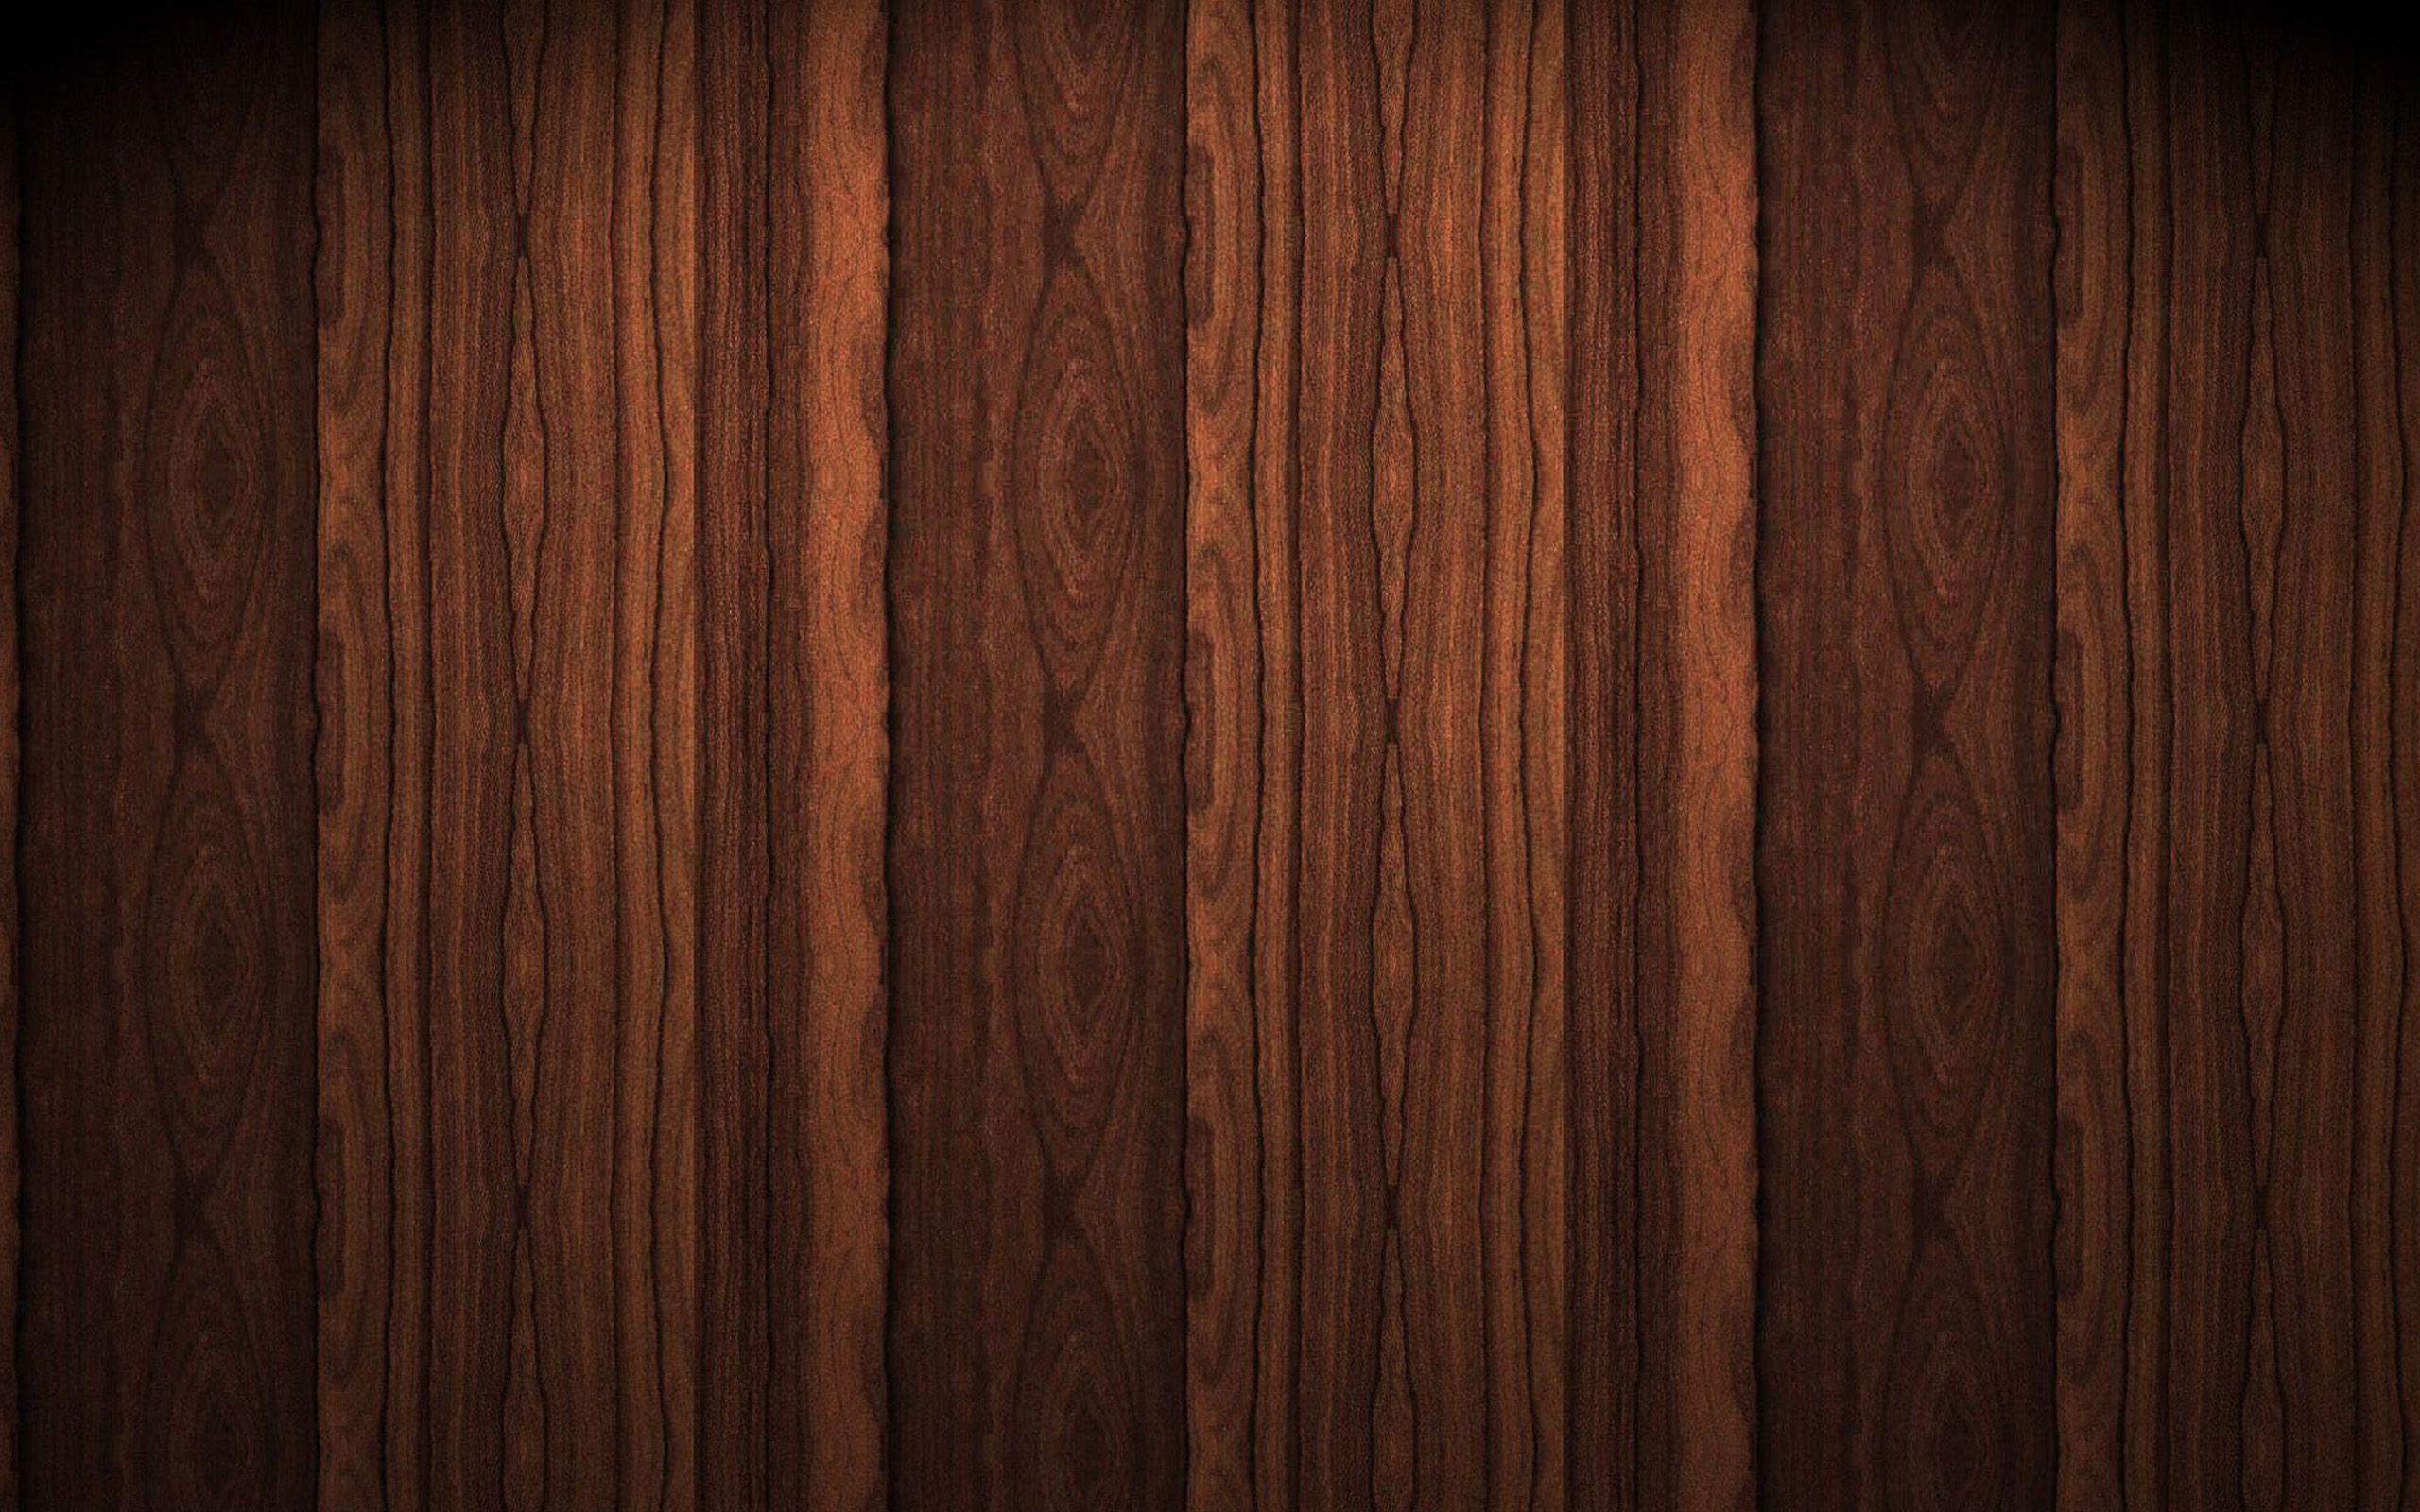 Pin by Navjot Kaur on Materials Dark wood texture, Wood